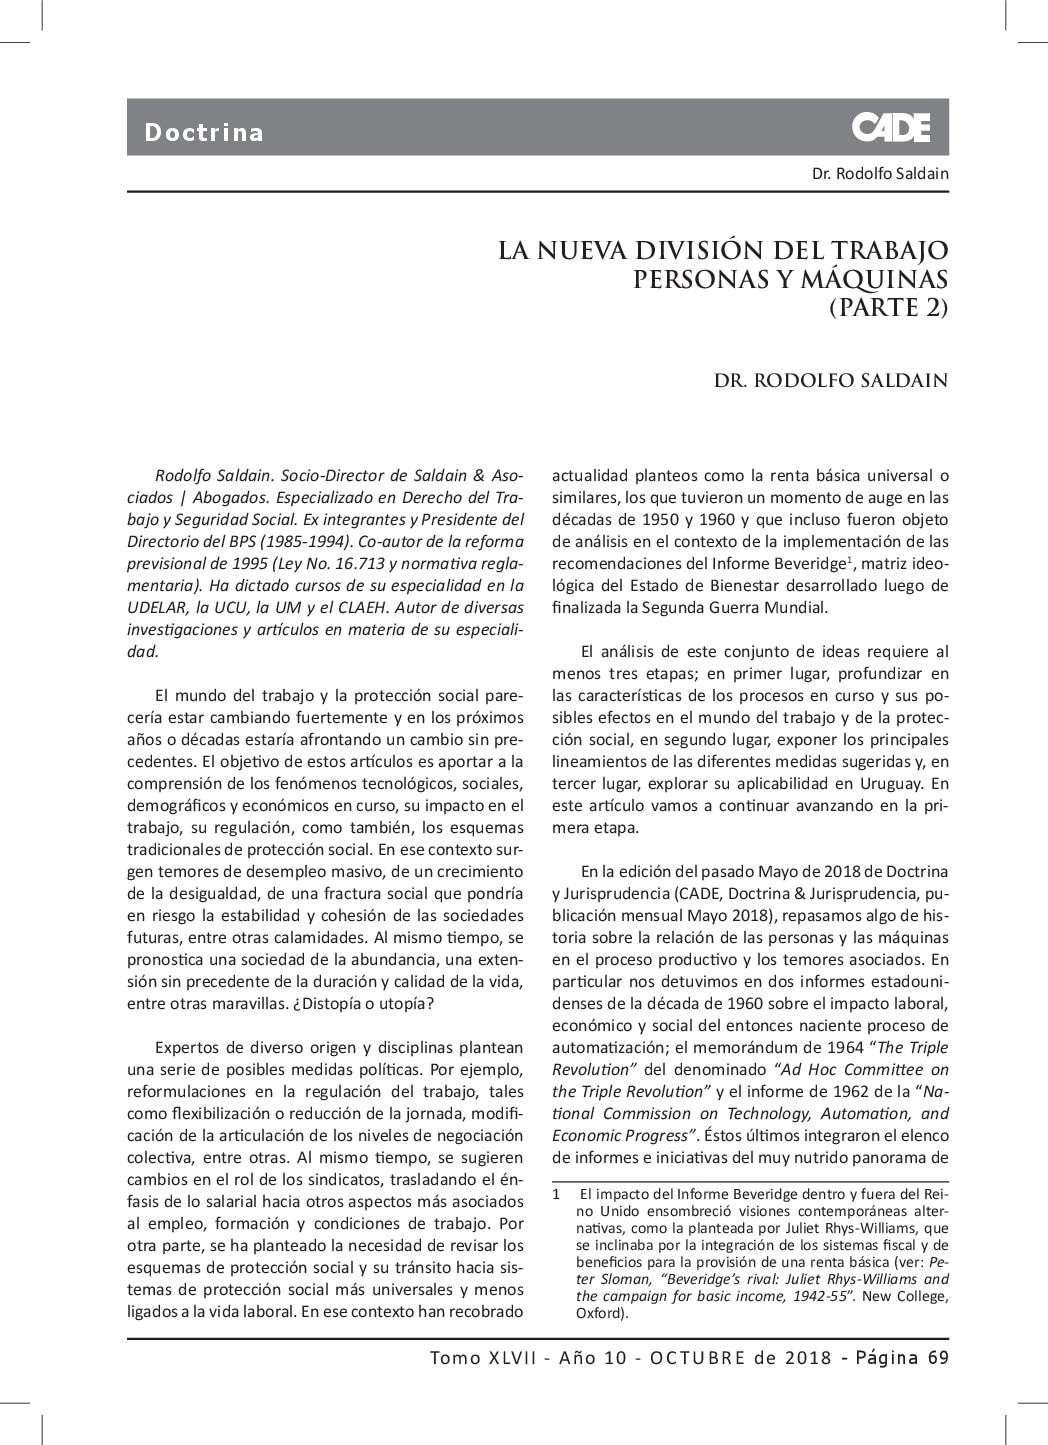 cade-doctrina-jurisprudencia-saldain-001